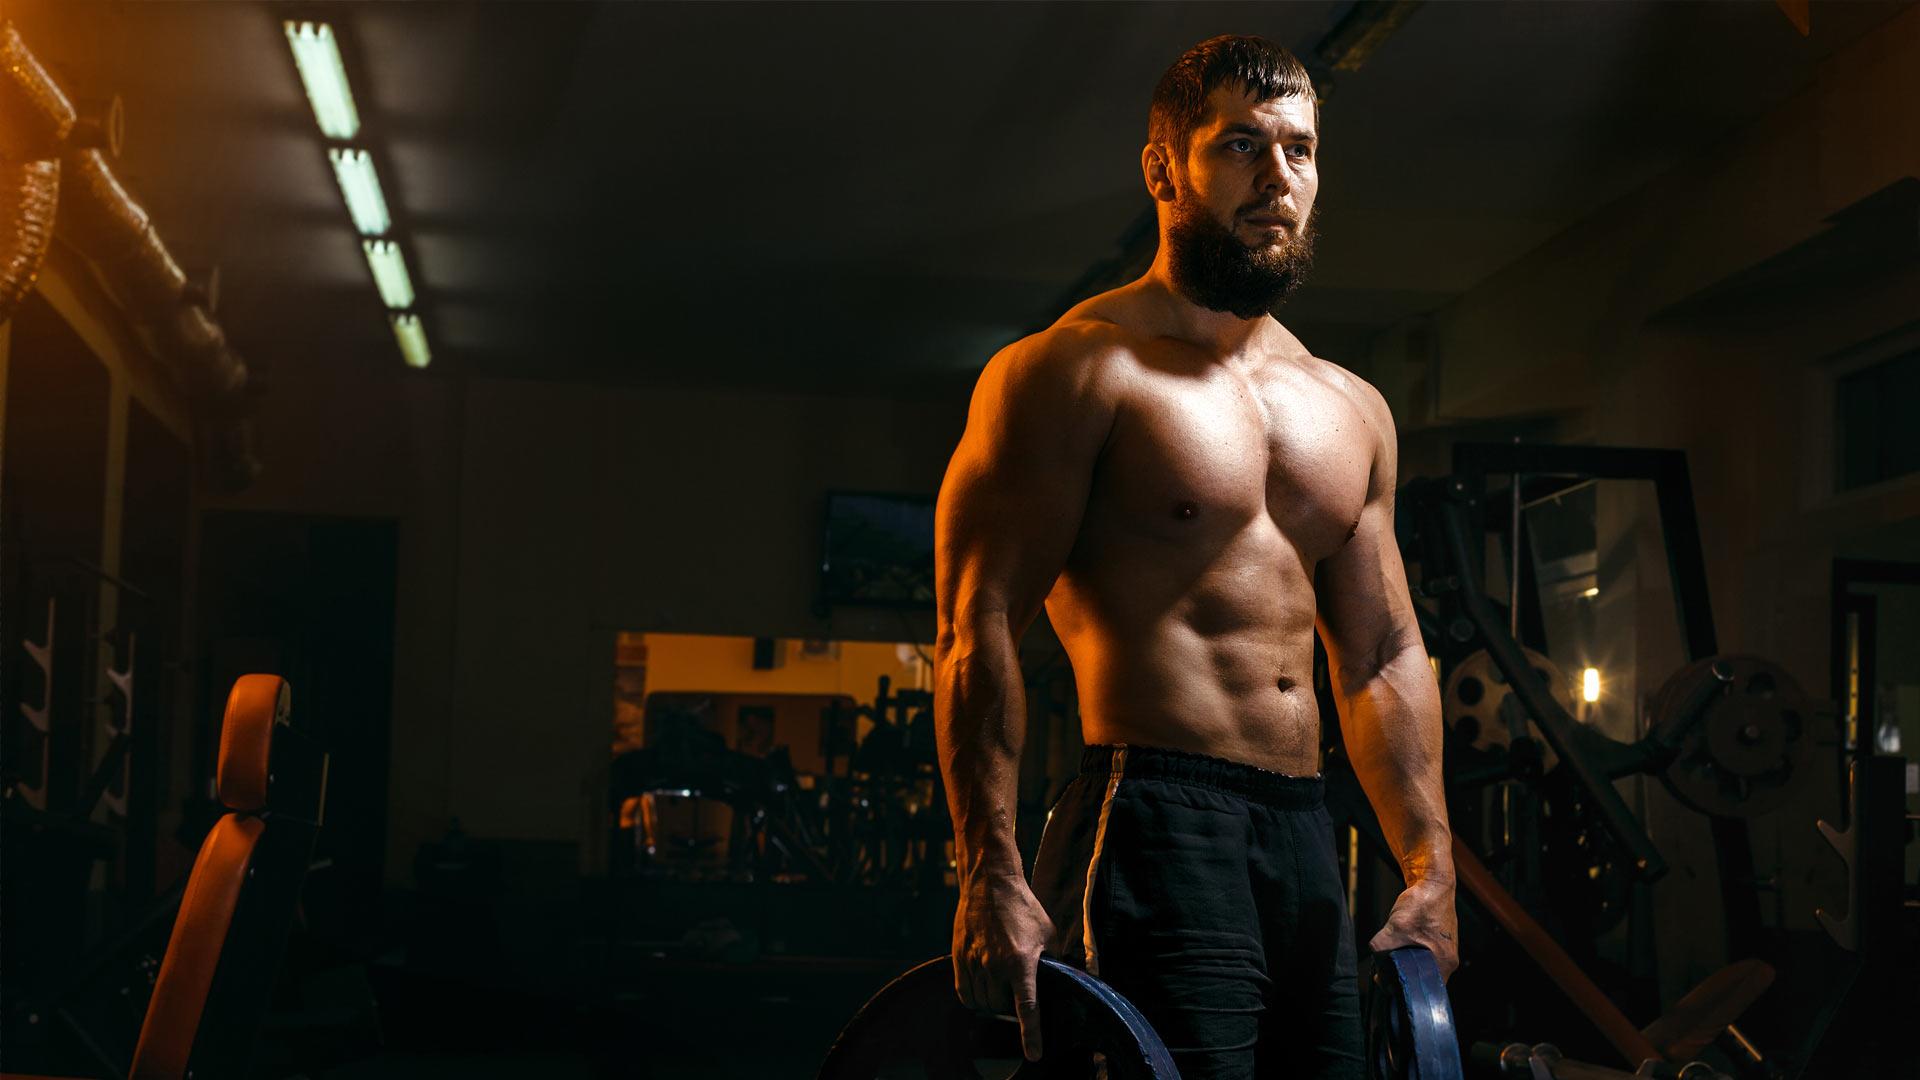 spartacus-workout